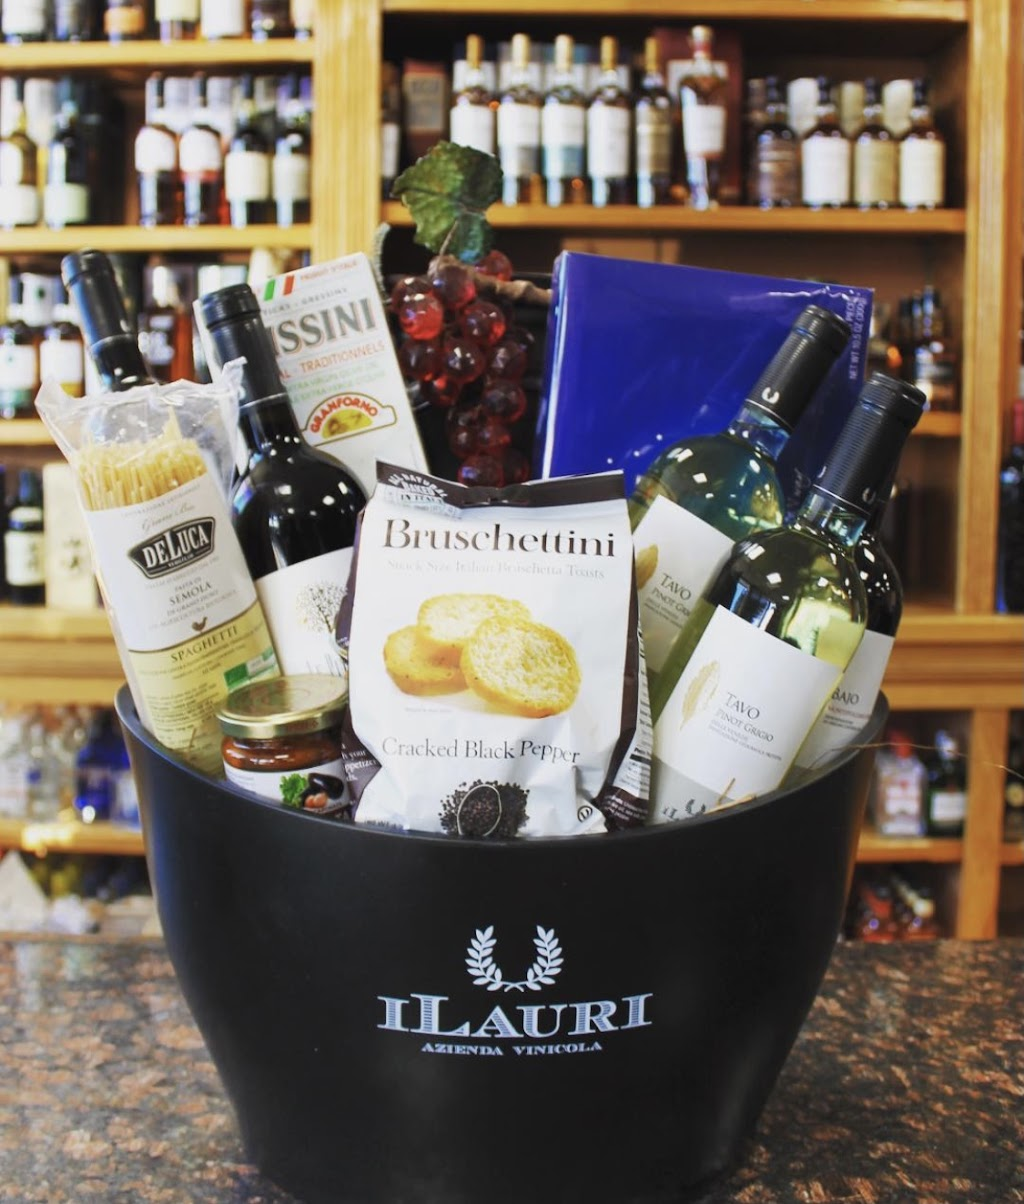 Wine Country Inc - store  | Photo 9 of 9 | Address: 741 Main St, Winchester, MA 01890, USA | Phone: (781) 721-1045